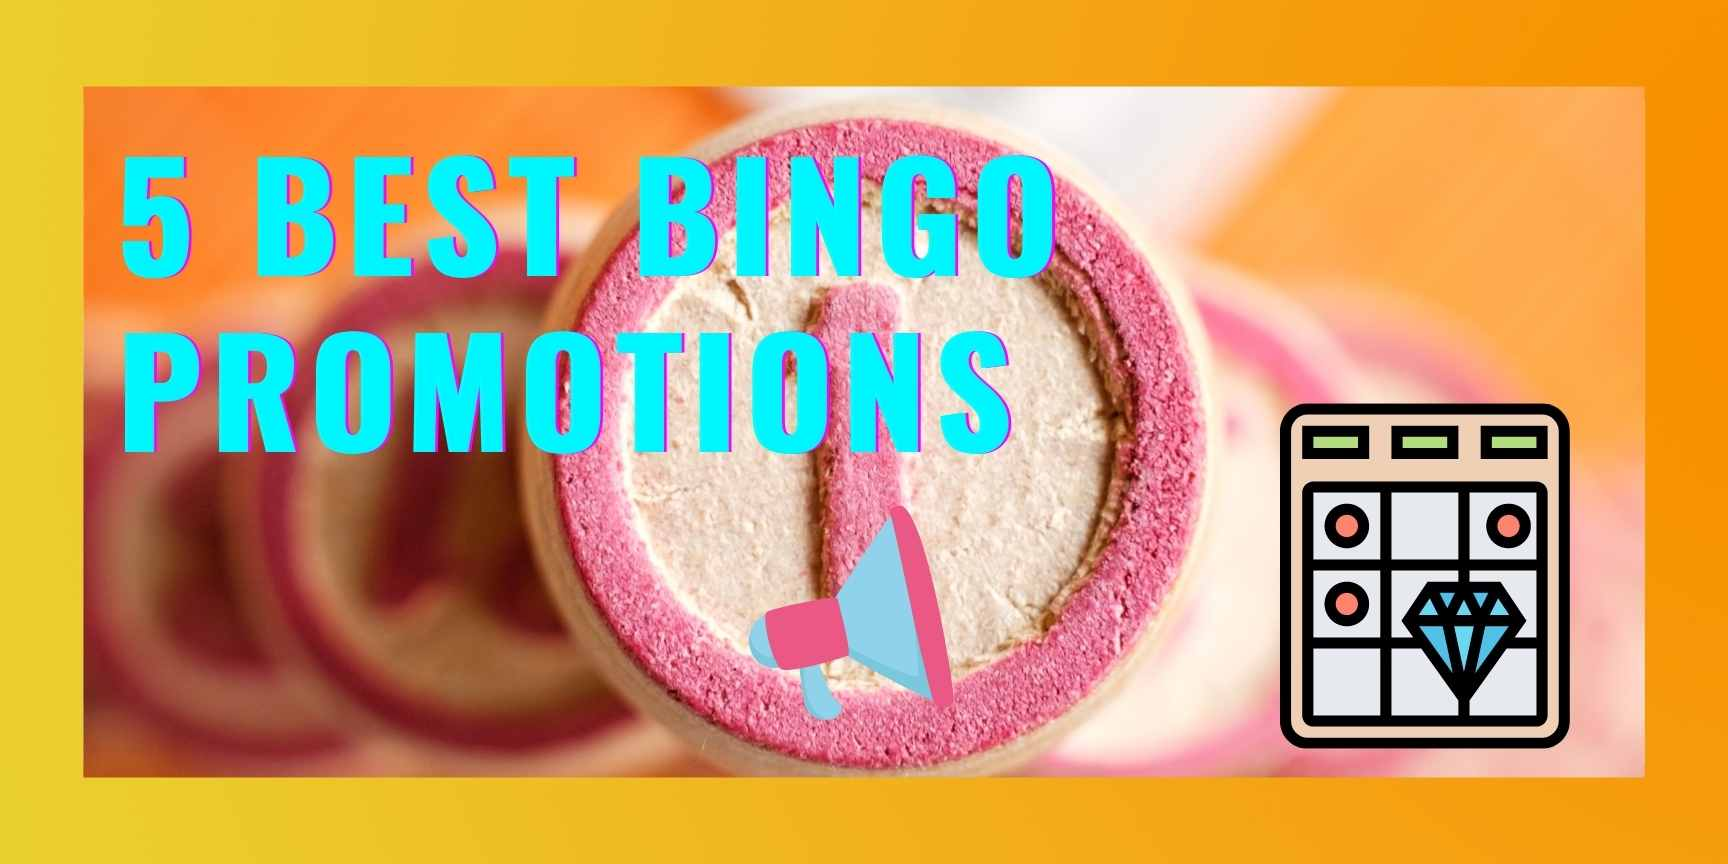 5 best bingo promotions